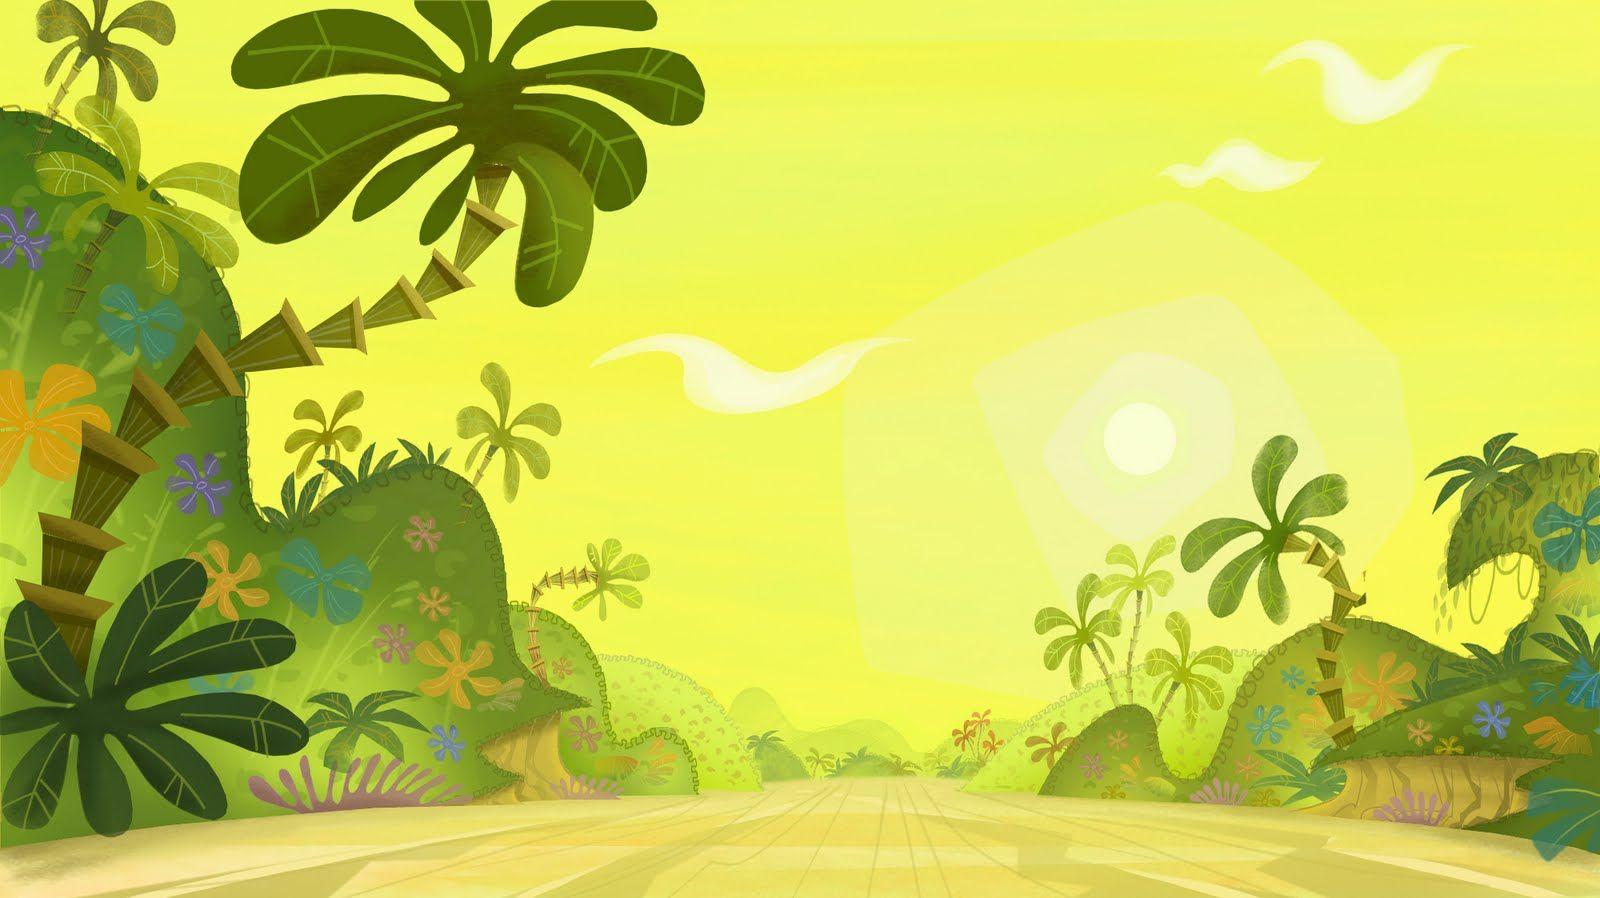 Safari Backgrounds - Wallpaper Cave